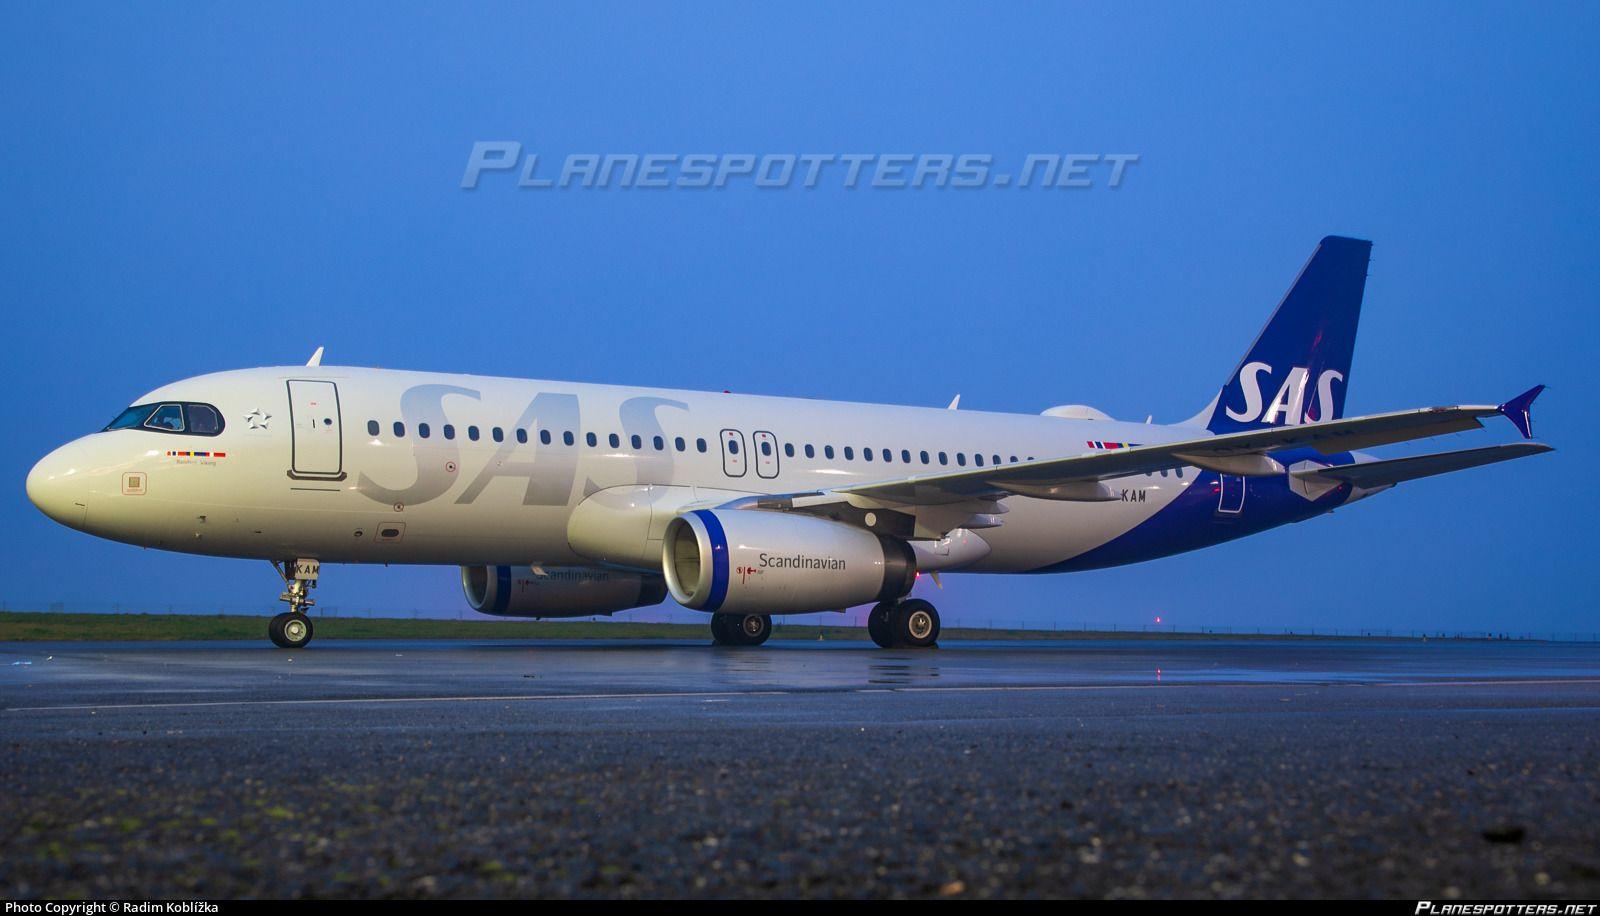 Oy Kam Sas Scandinavian Airlines Airbus A320 232 Photo By Radim Koblizka Id 1016793 Planespotters Net In 2020 Sas Airlines Airbus Sas